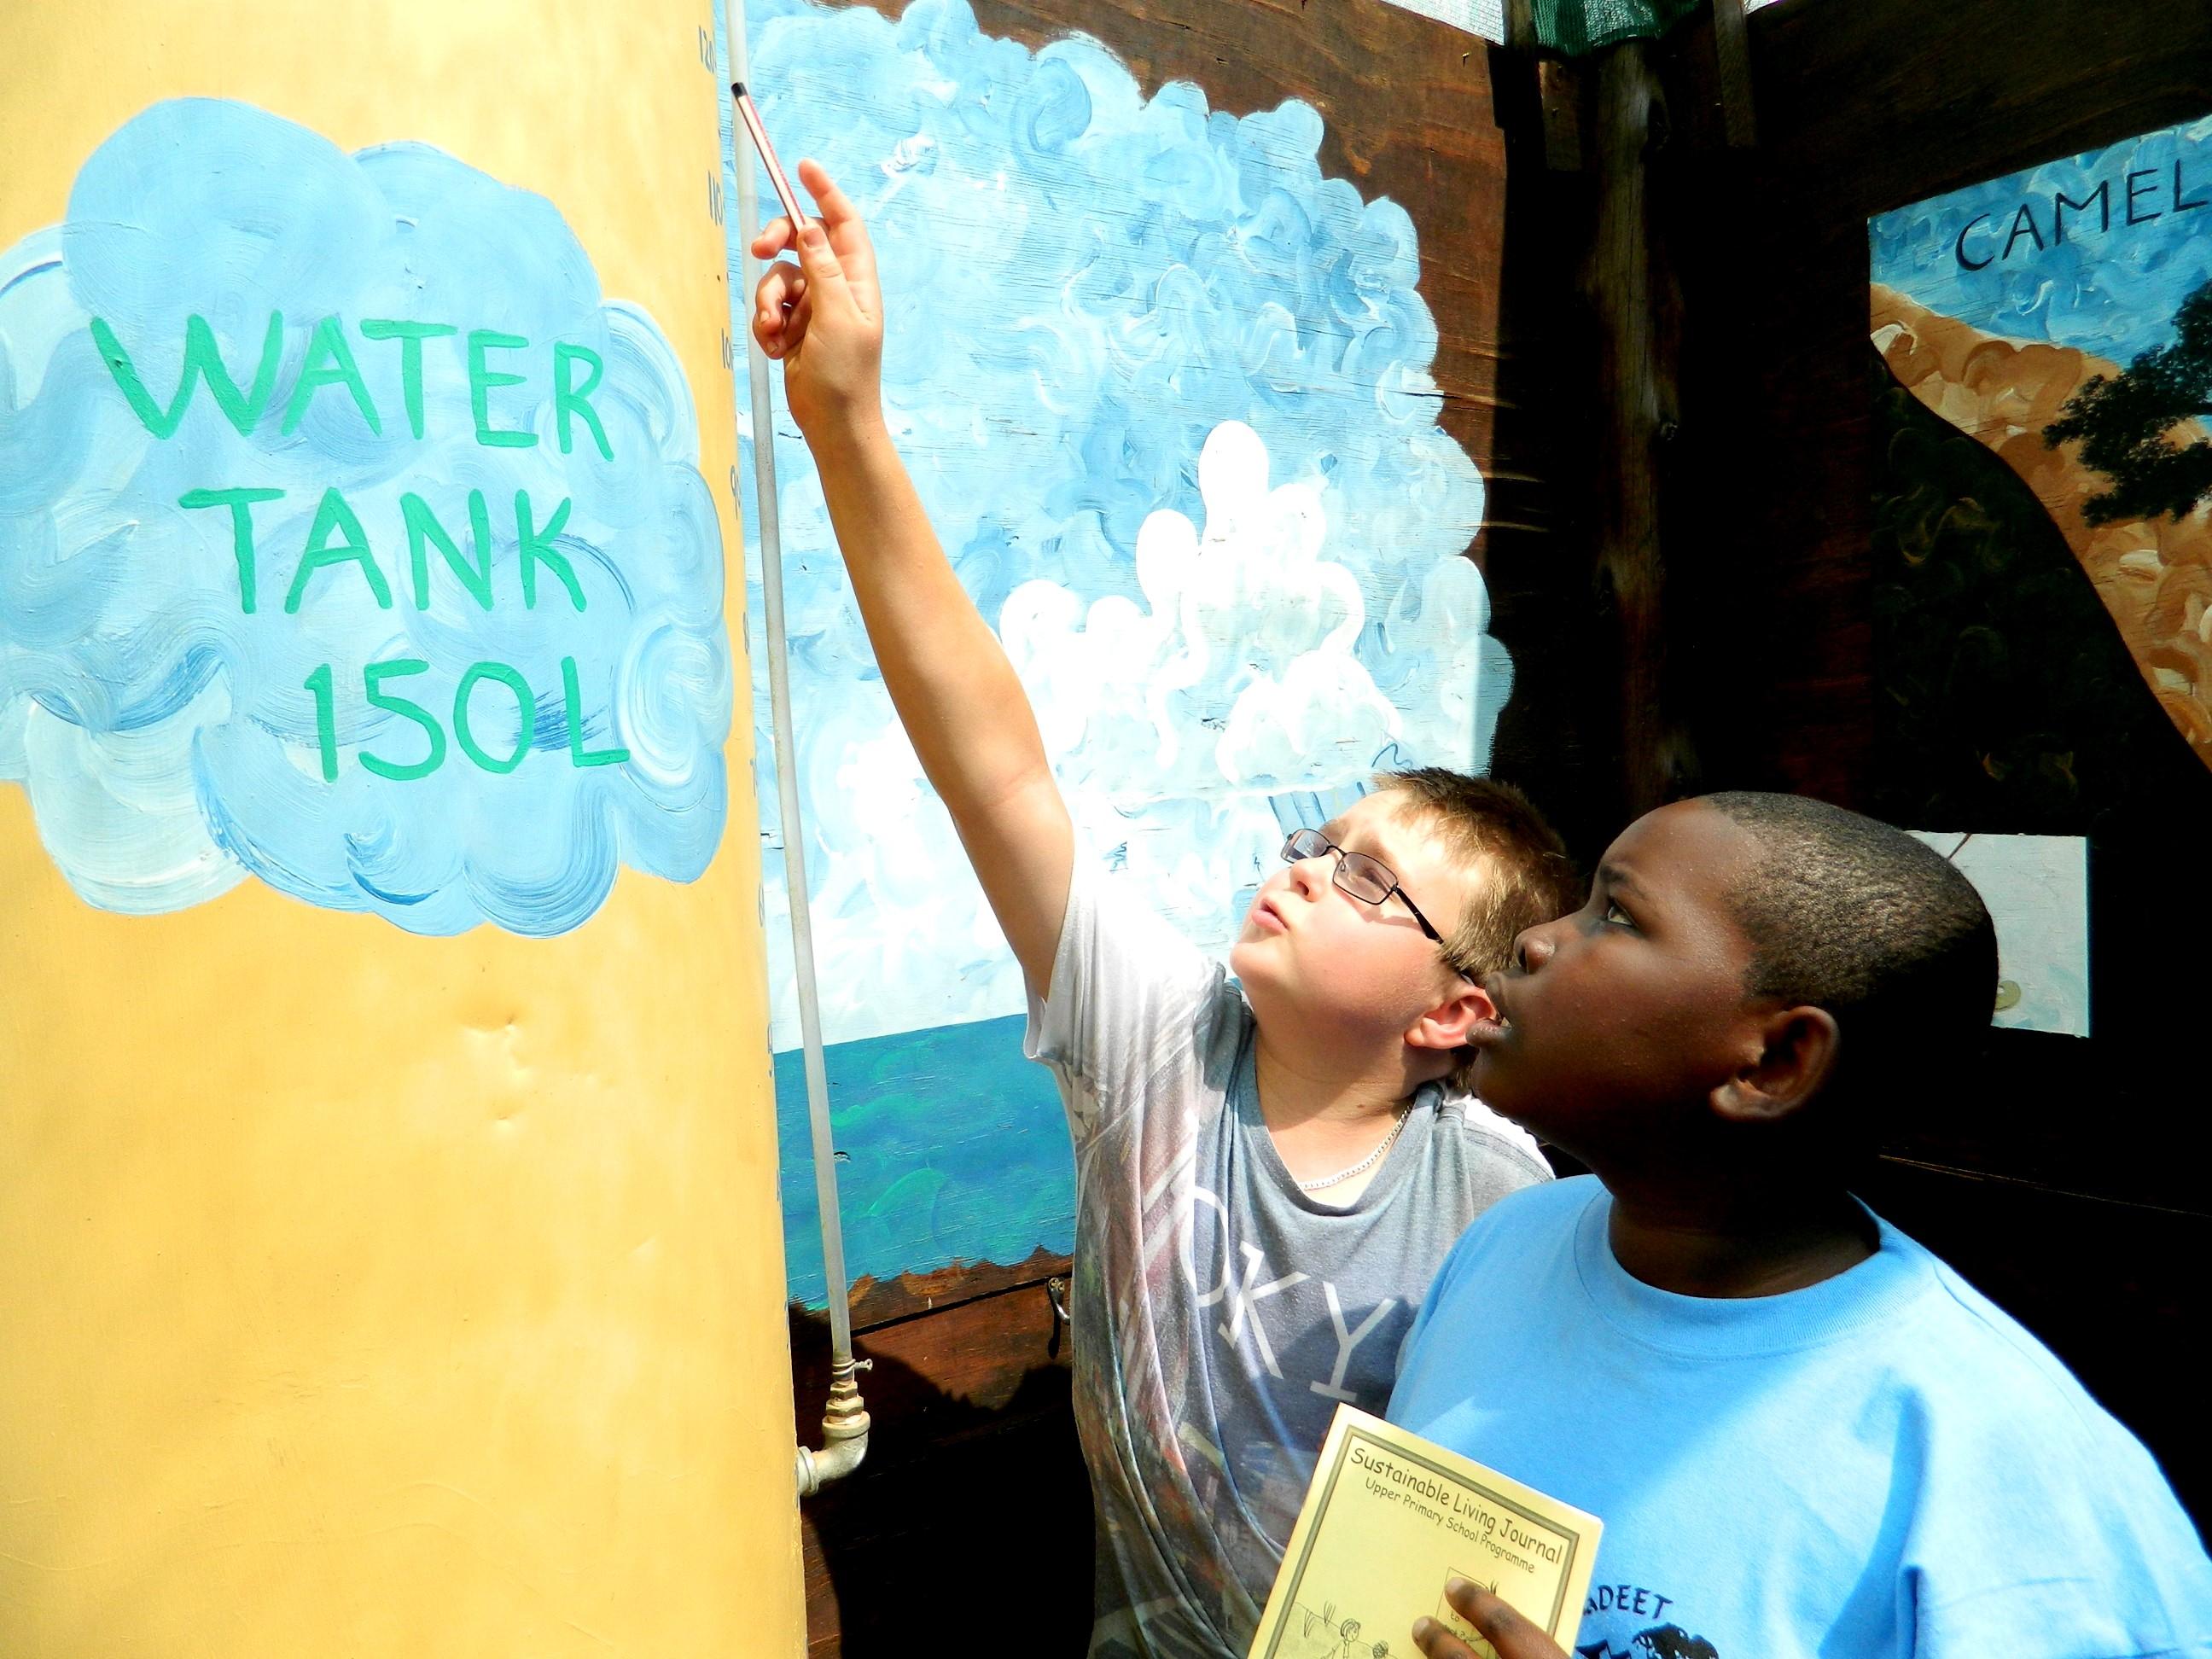 Measuring the water tank